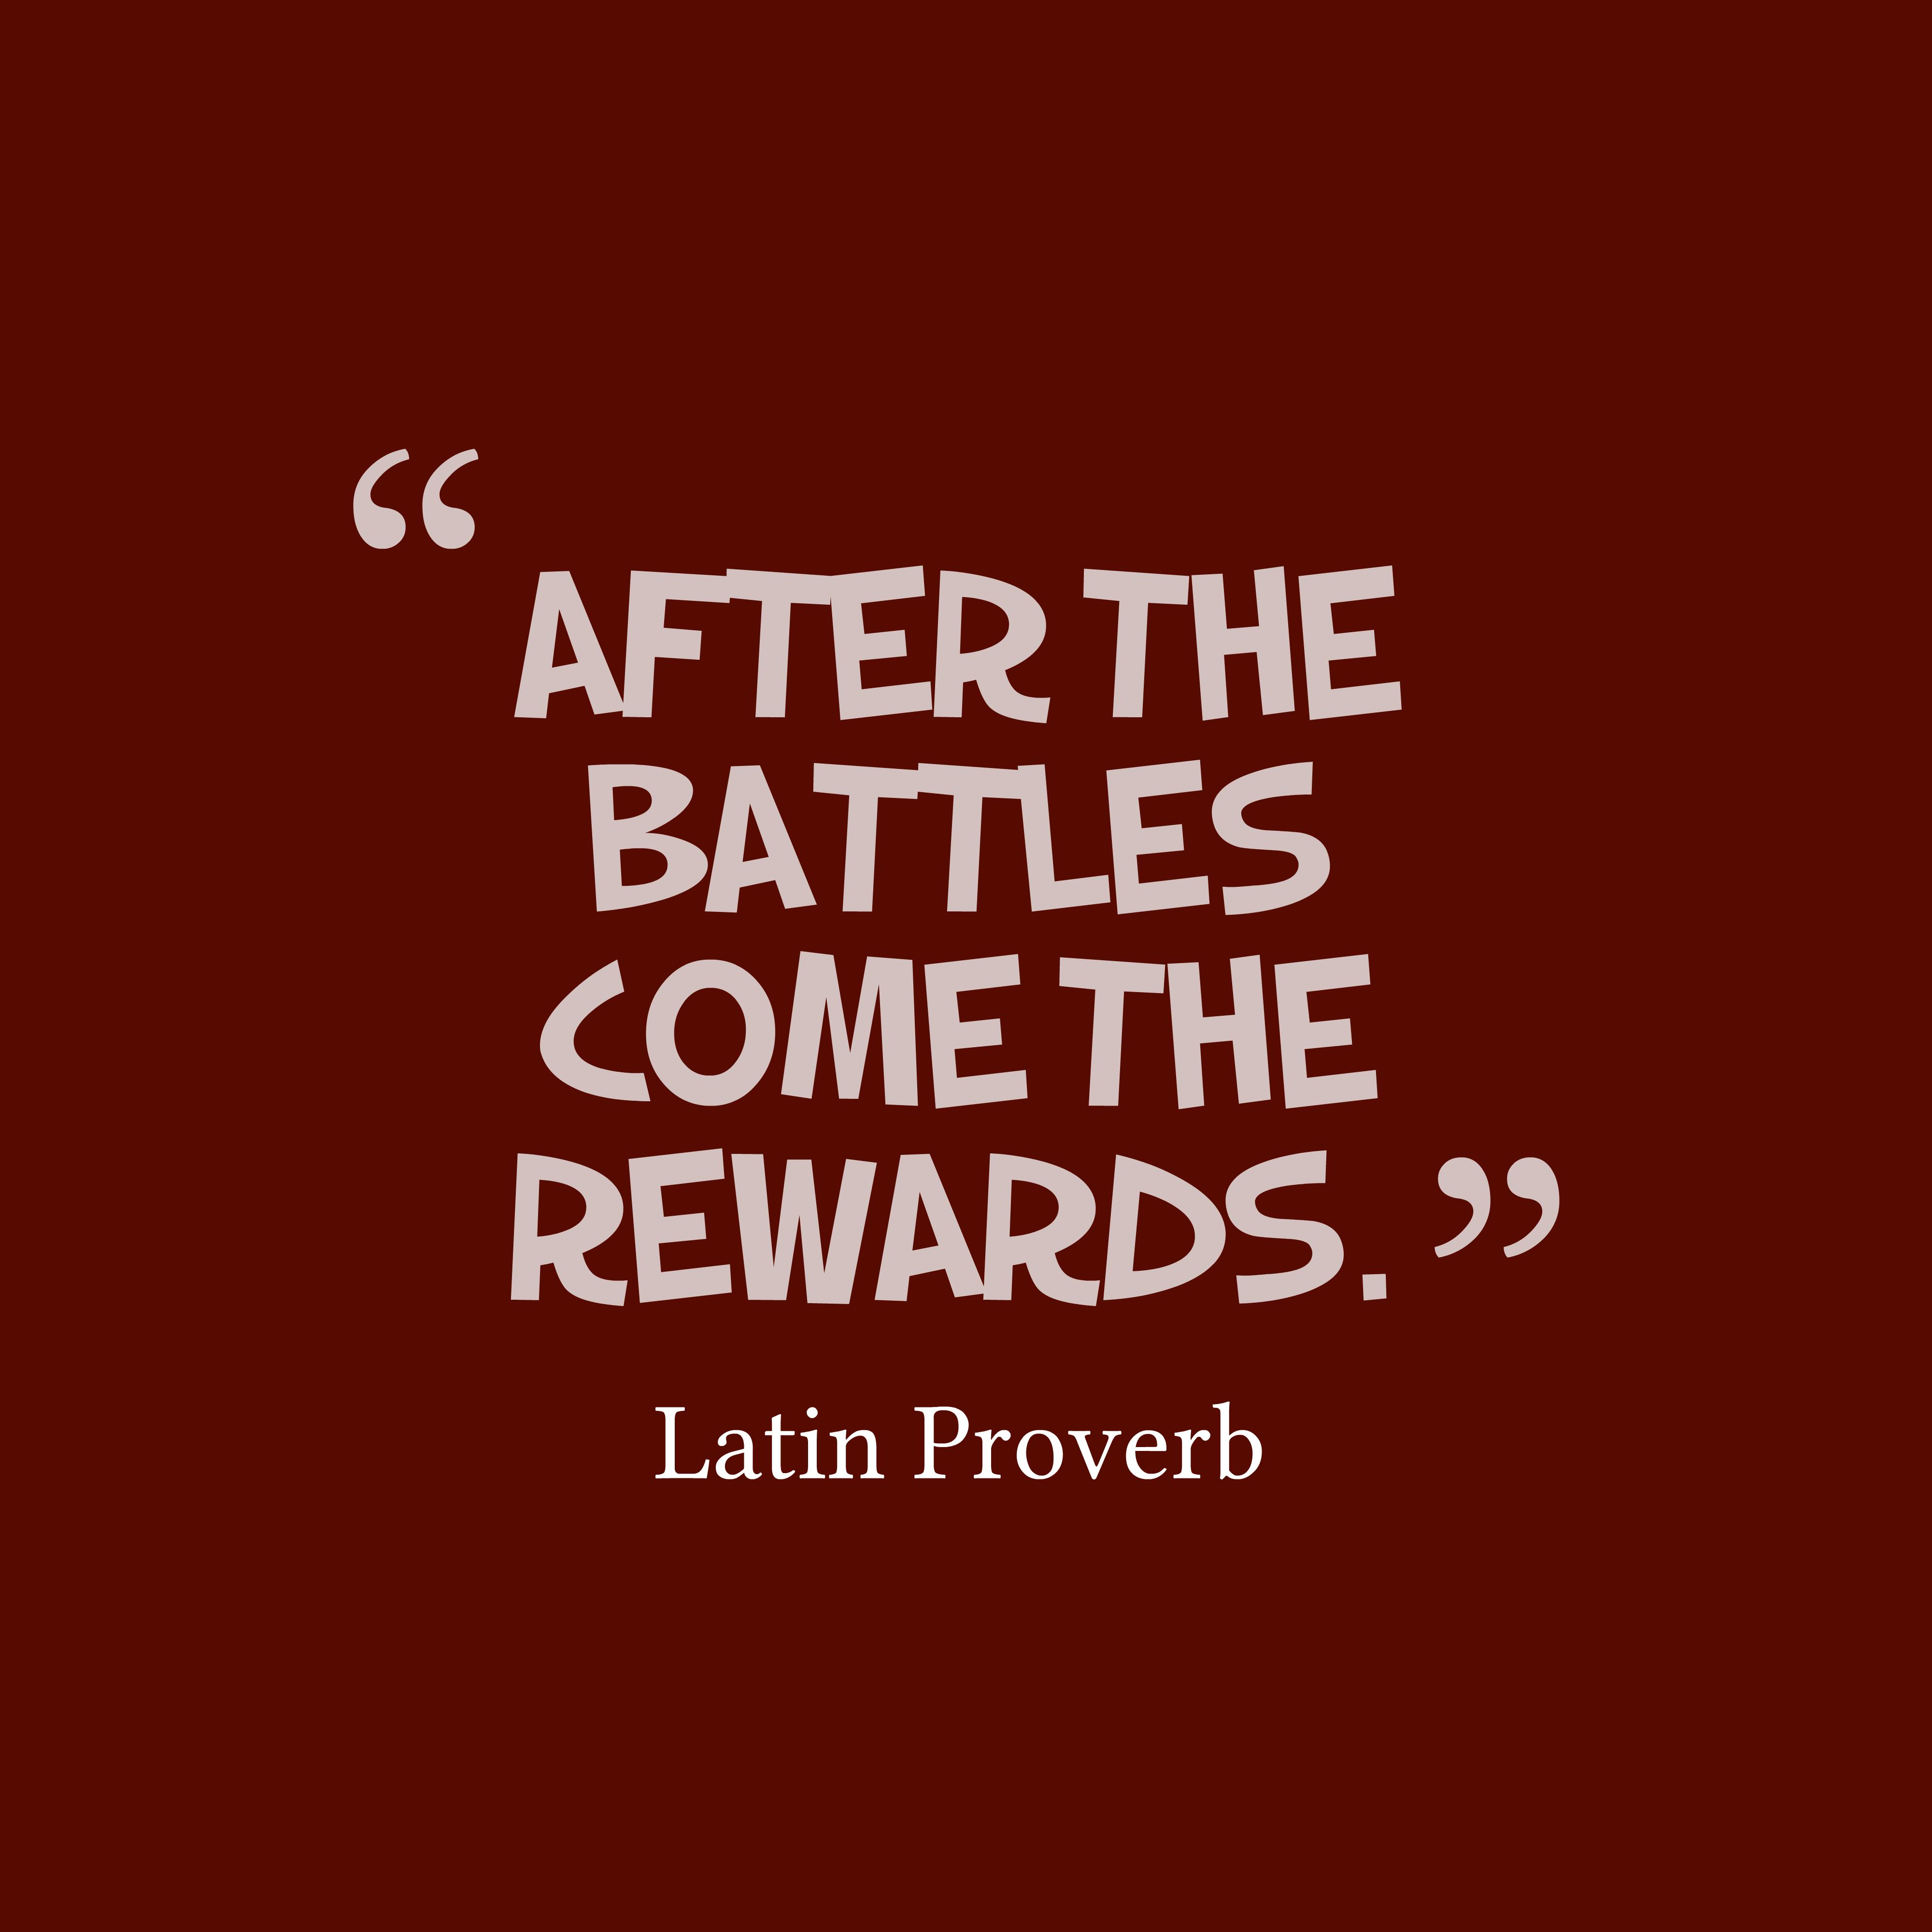 Latin Wisdom About Advertises: Latin Wisdom About Battles